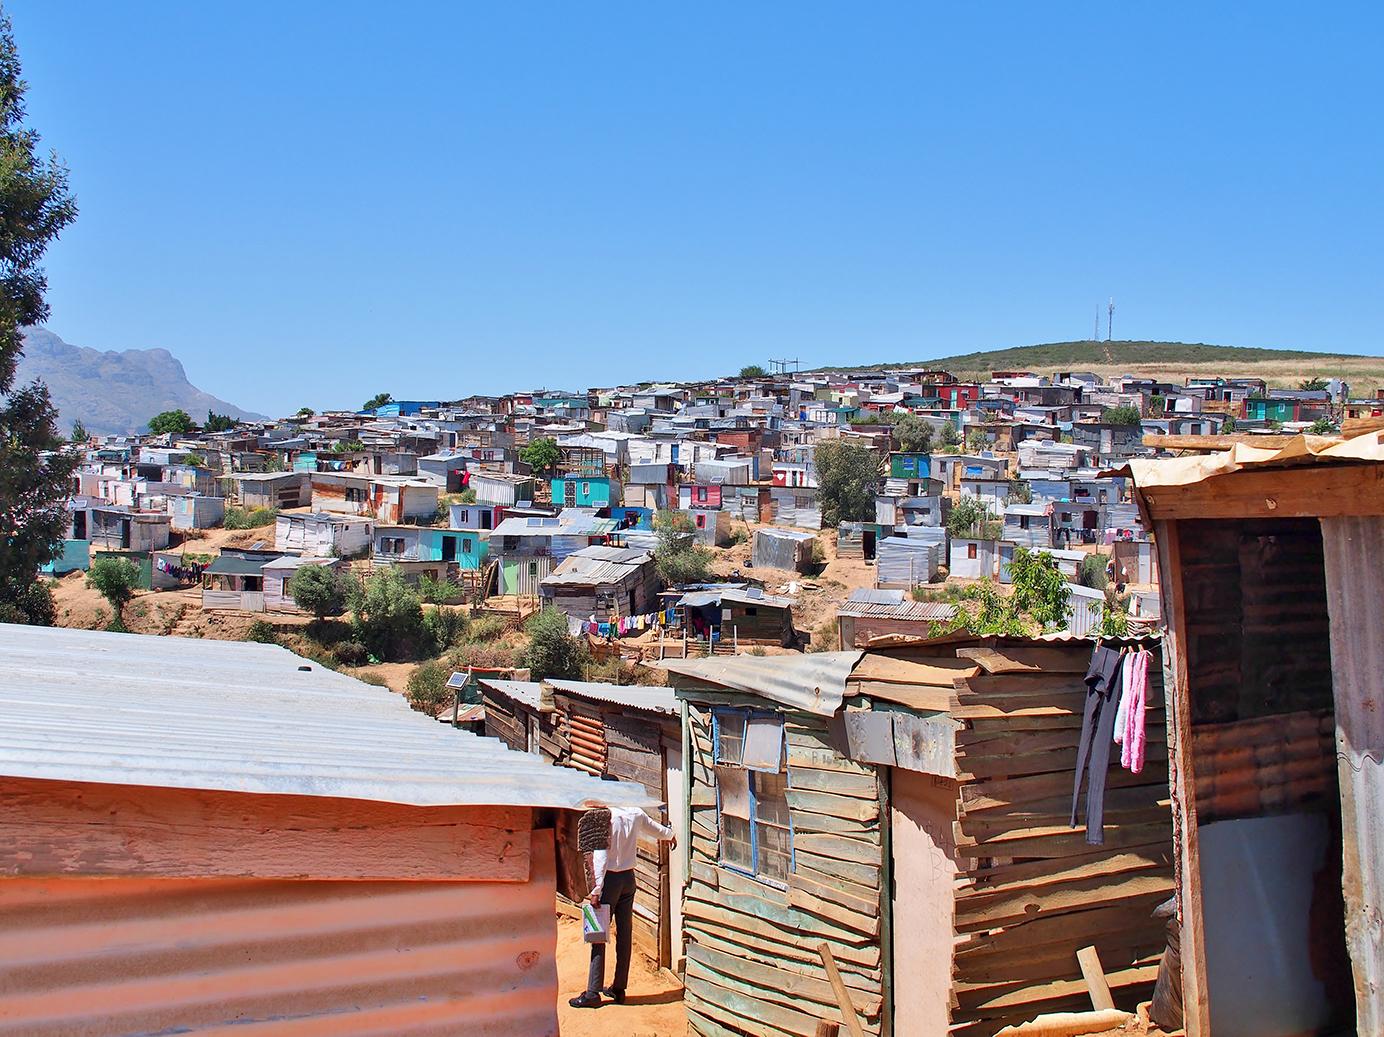 Township built on sandy hill in Stellenbosch South Africa